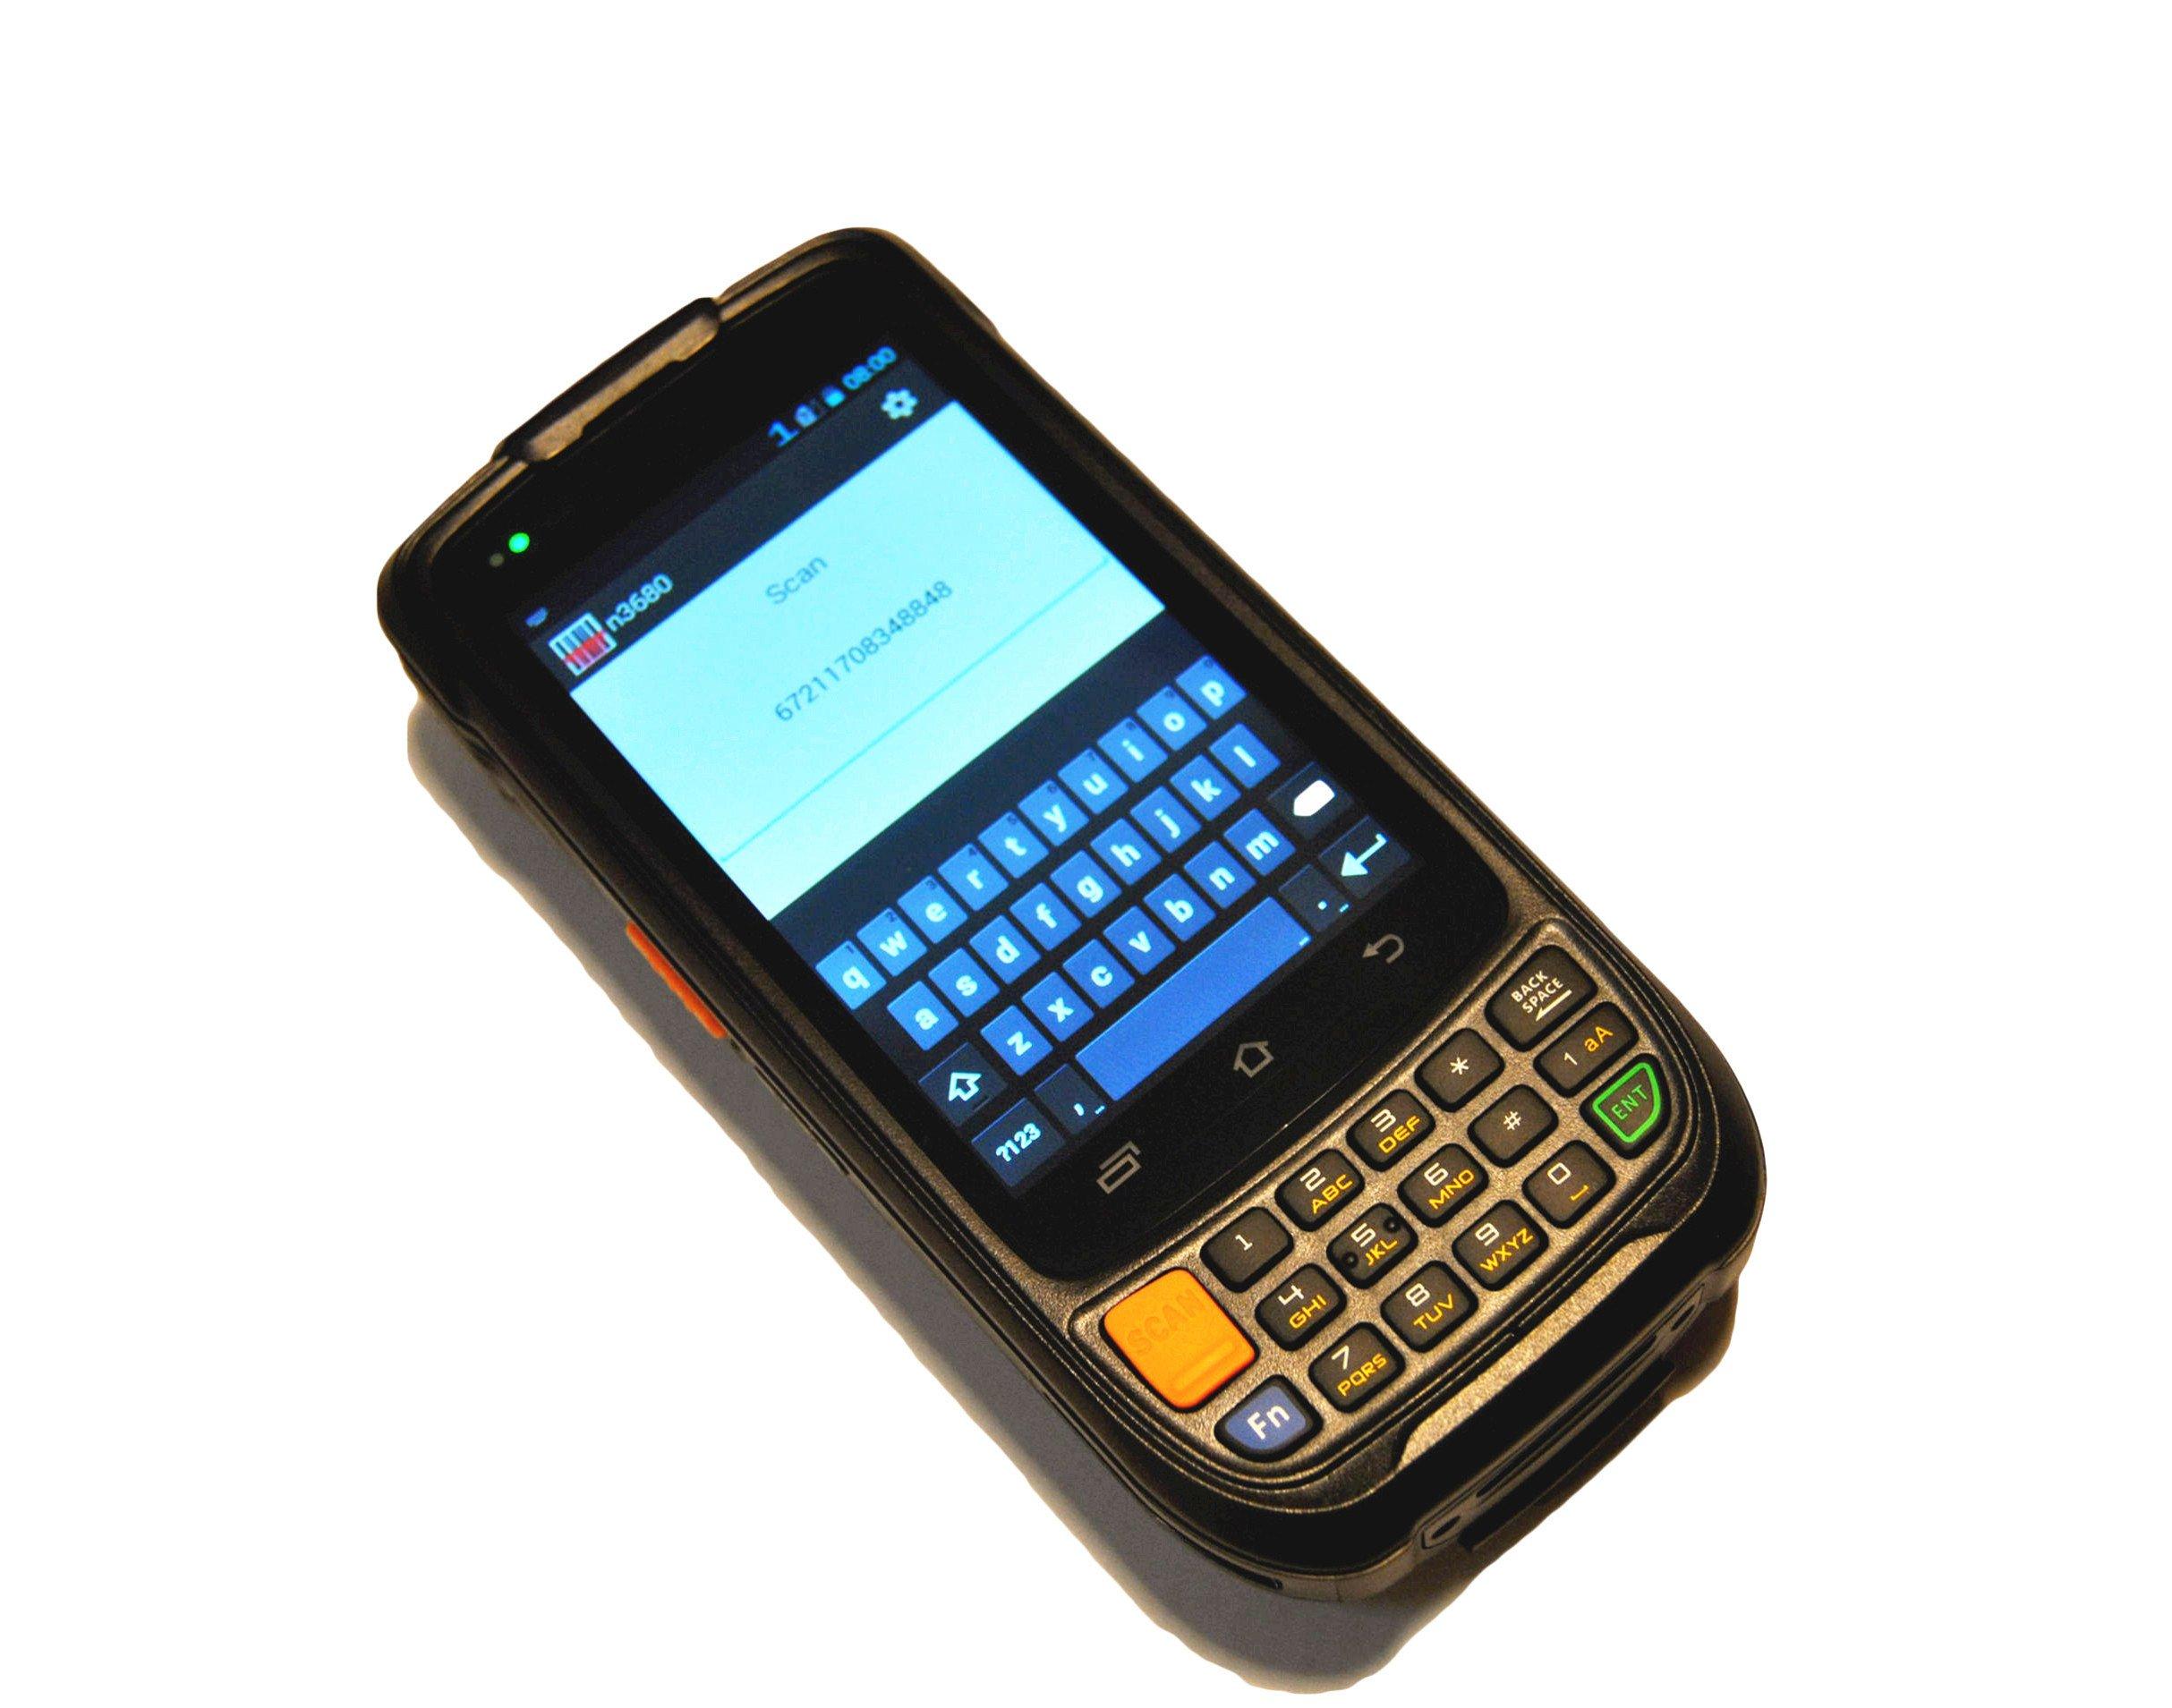 Cruiser@ Handheld Barcode Scanner PDA with Motorola Symbol 1D Laser Scan Engine, RFID reader / NFC, 802.11b/g/n, GSM/GPRS/WCDMA, Charging Cradle Included